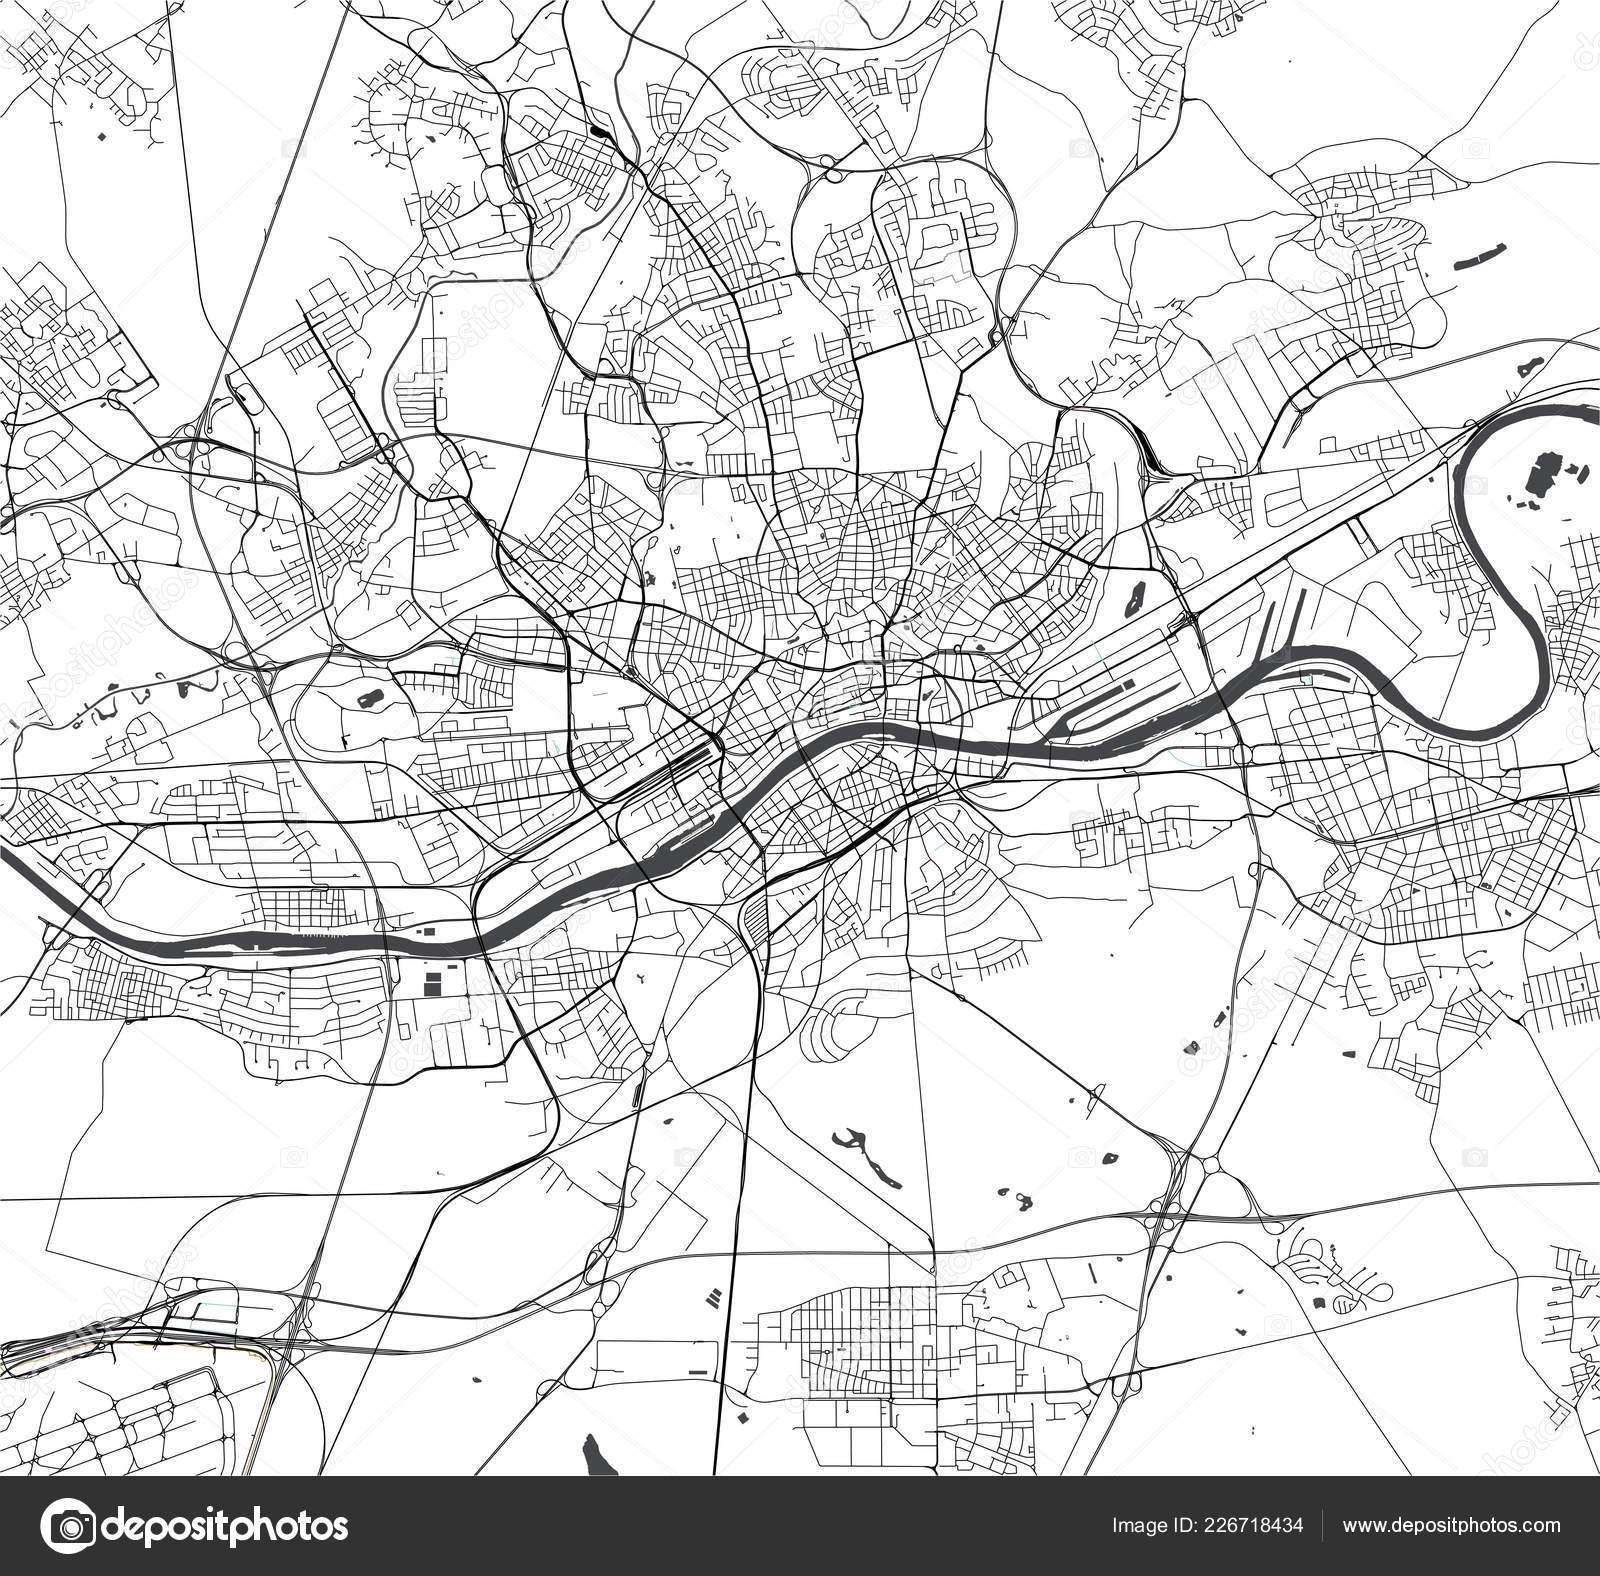 Map Of Germany Frankfurt.Map Of The City Of Frankfurt Am Main Hesse Germany Stock Vector